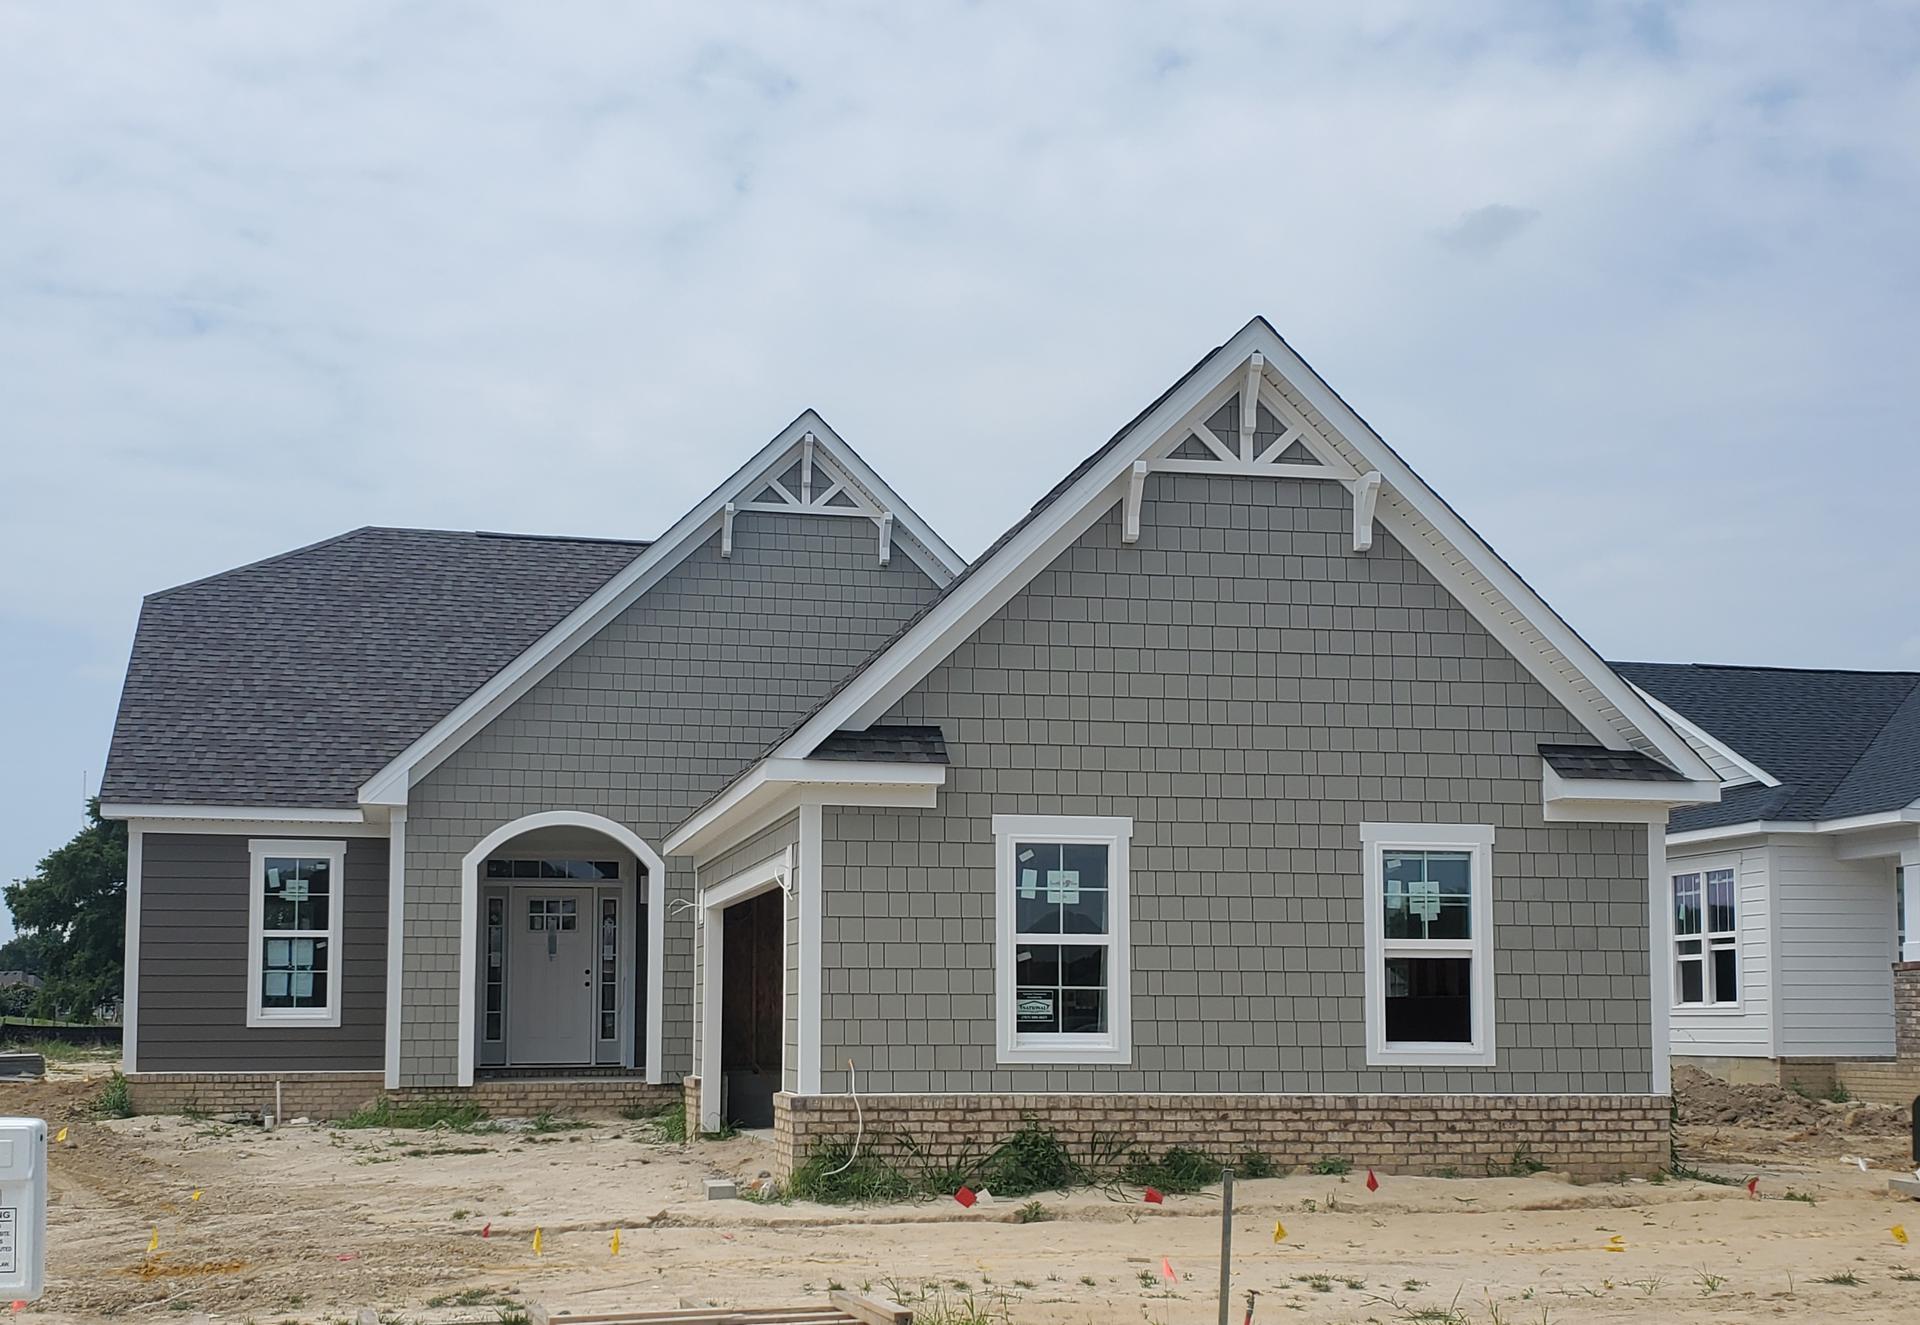 413 St. Andrews, Smithfield, VA 23430 Home for Sale